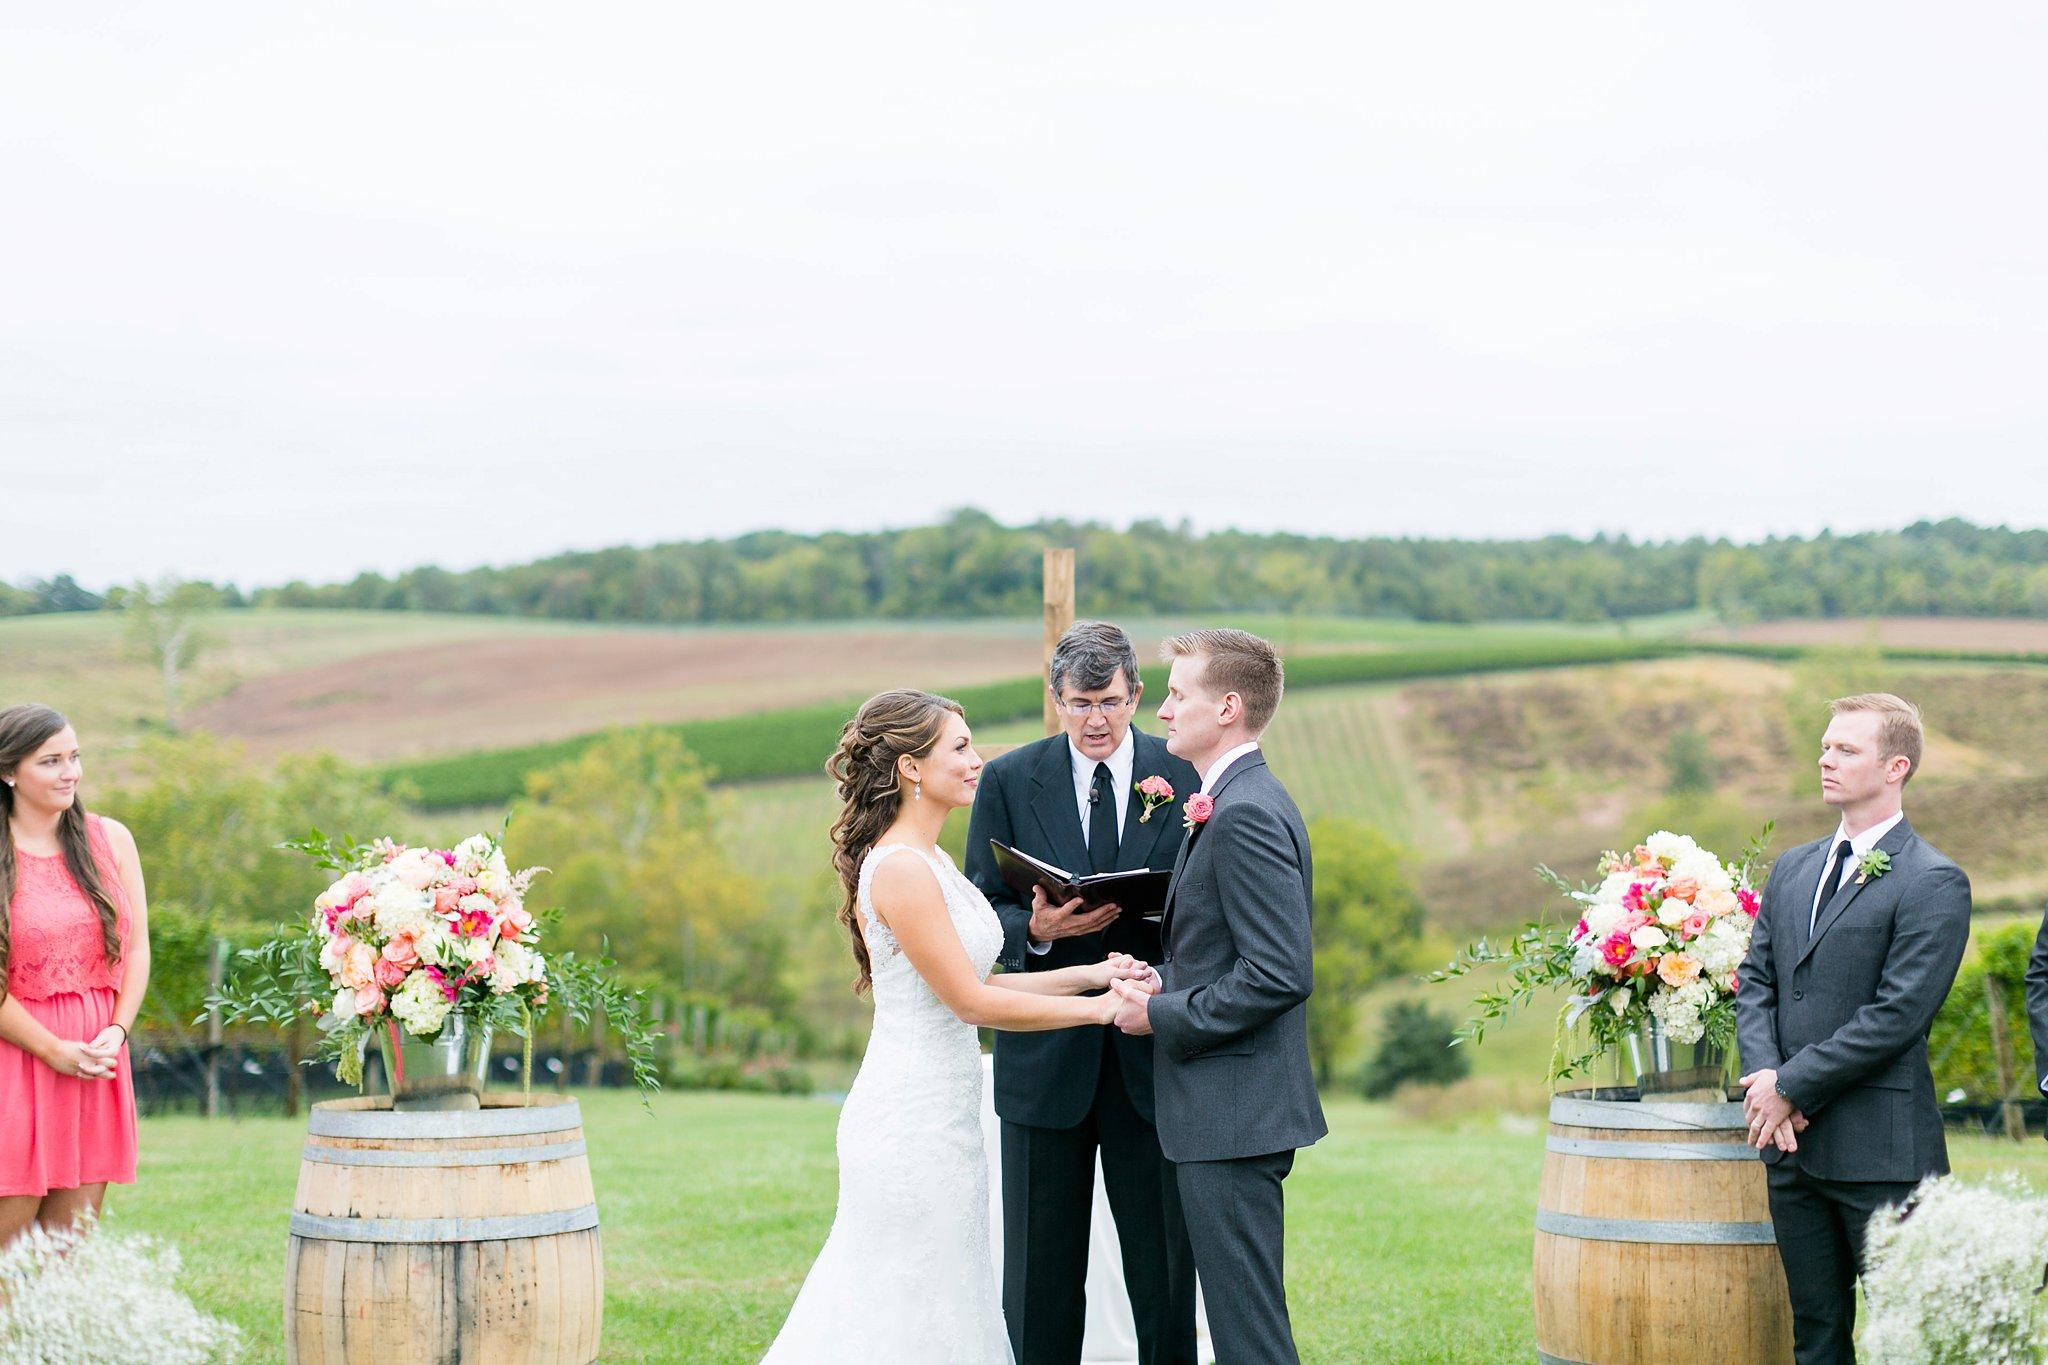 Stone Tower Winery Wedding Photos Virginia Wedding Photographer Megan Kelsey Photography Sam & Angela-155.jpg